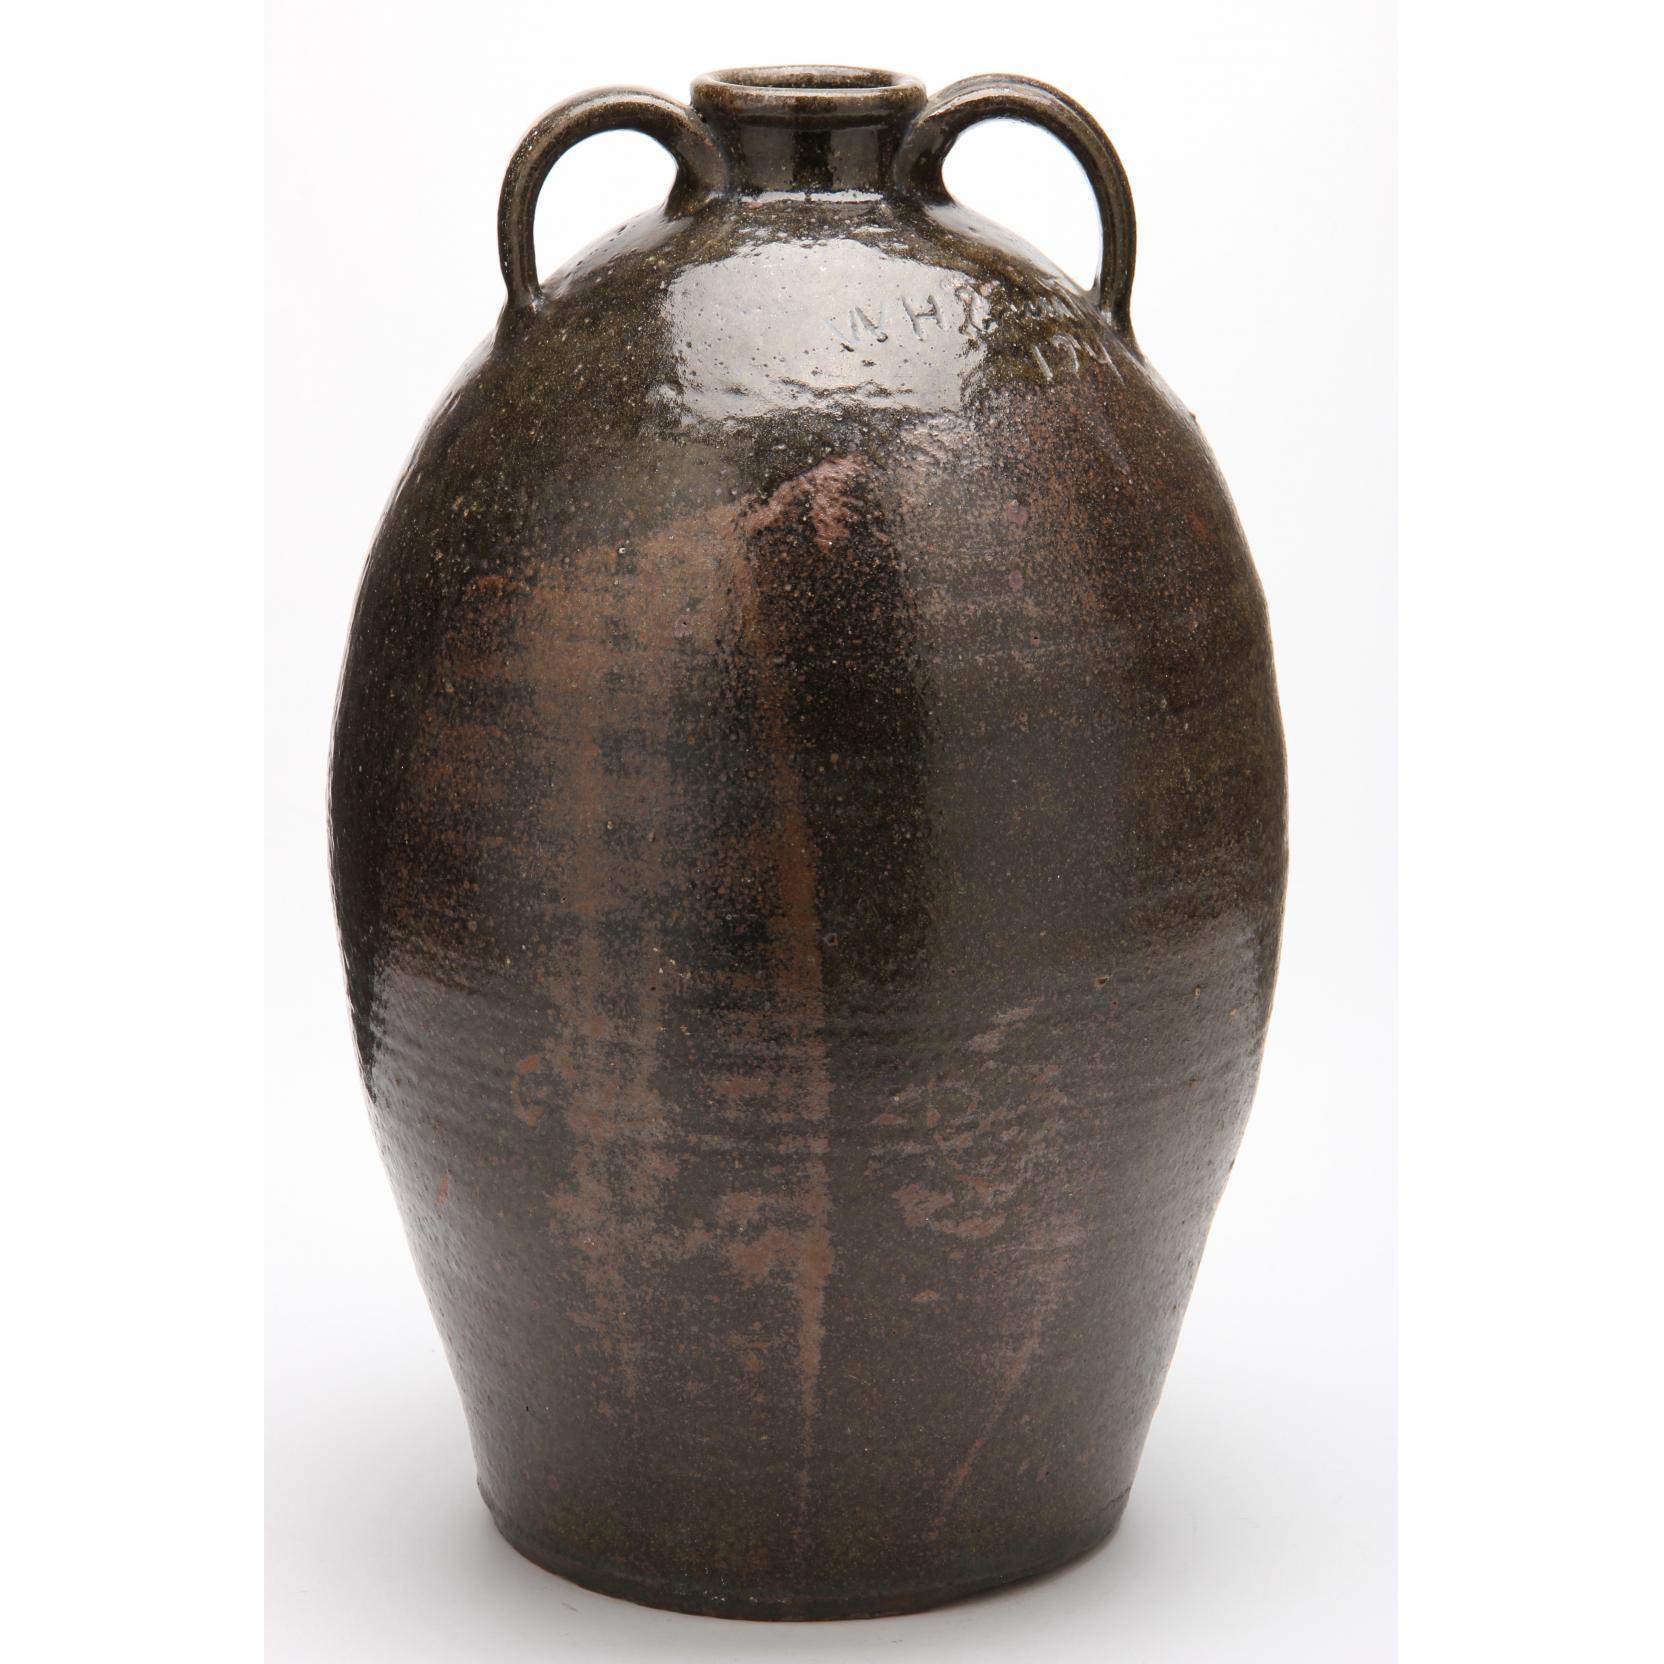 nc-pottery-molasses-jug-wade-smith-1855-1928-lincoln-county